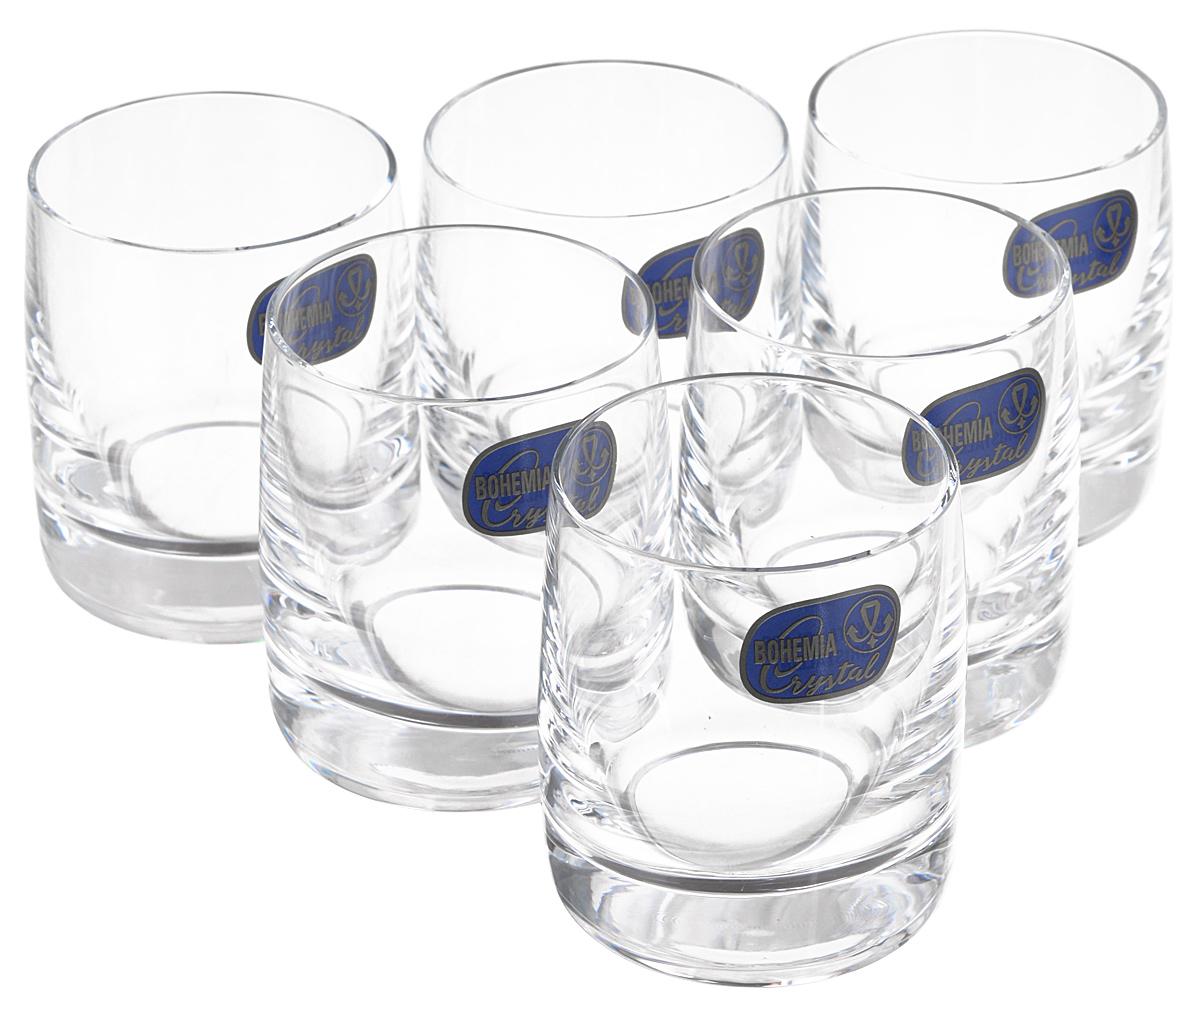 Набор стопок для водки Bohemia Crystall Идеал, 60 мл, 6 шт бокалы злата bohemia crystall